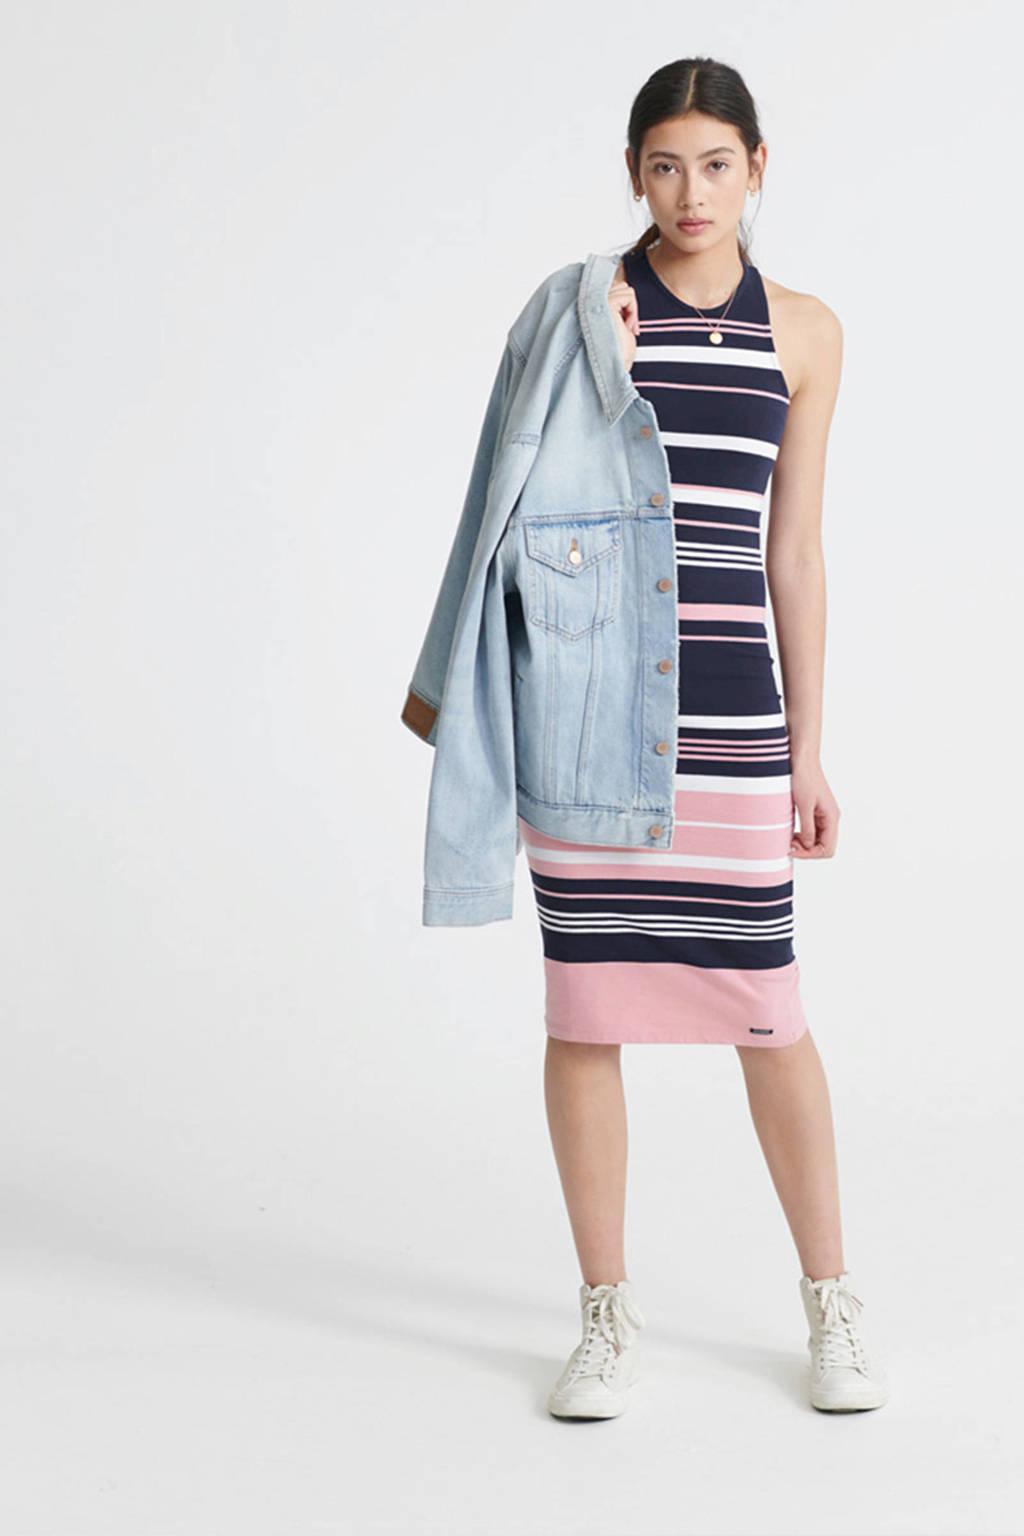 Superdry jersey jurk roze/blauw/wit, Roze/blauw/wit